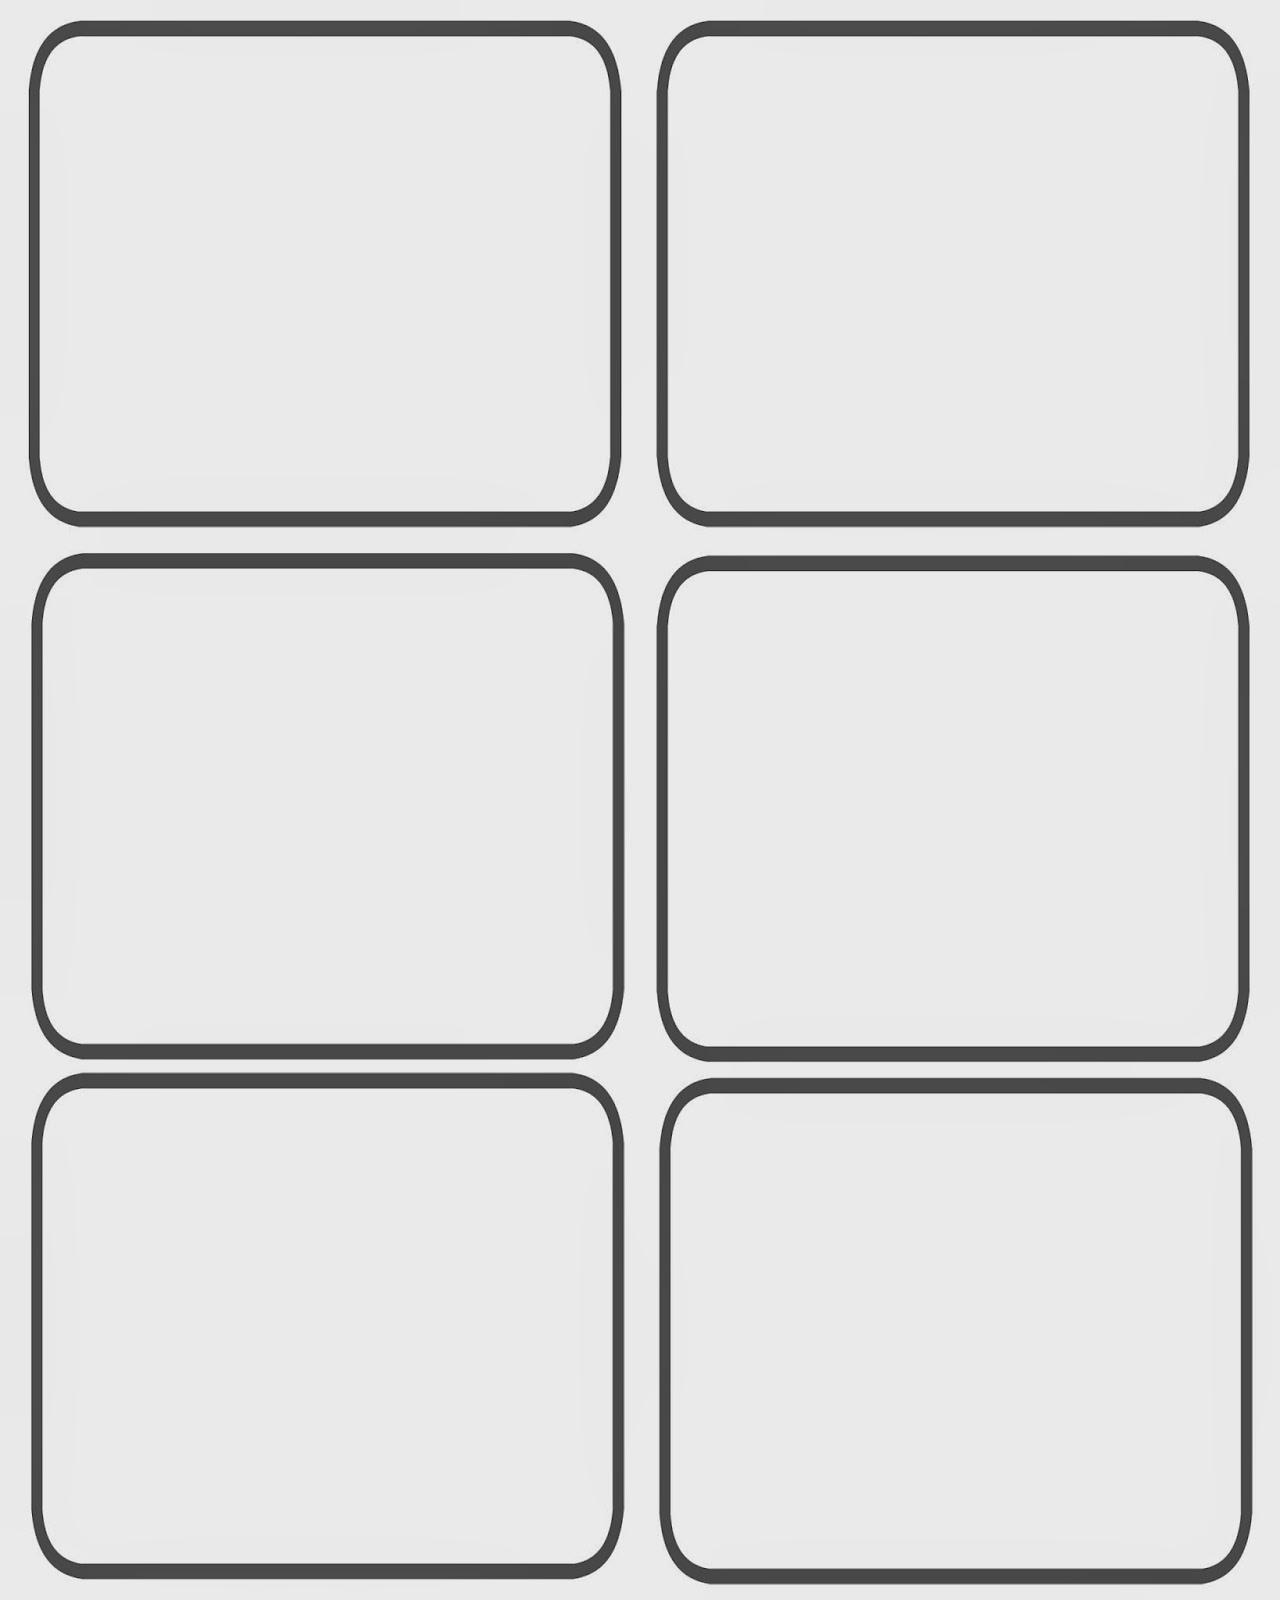 restlessrisa: Free Printable Valentine Game Regarding Free Printable Playing Cards Template